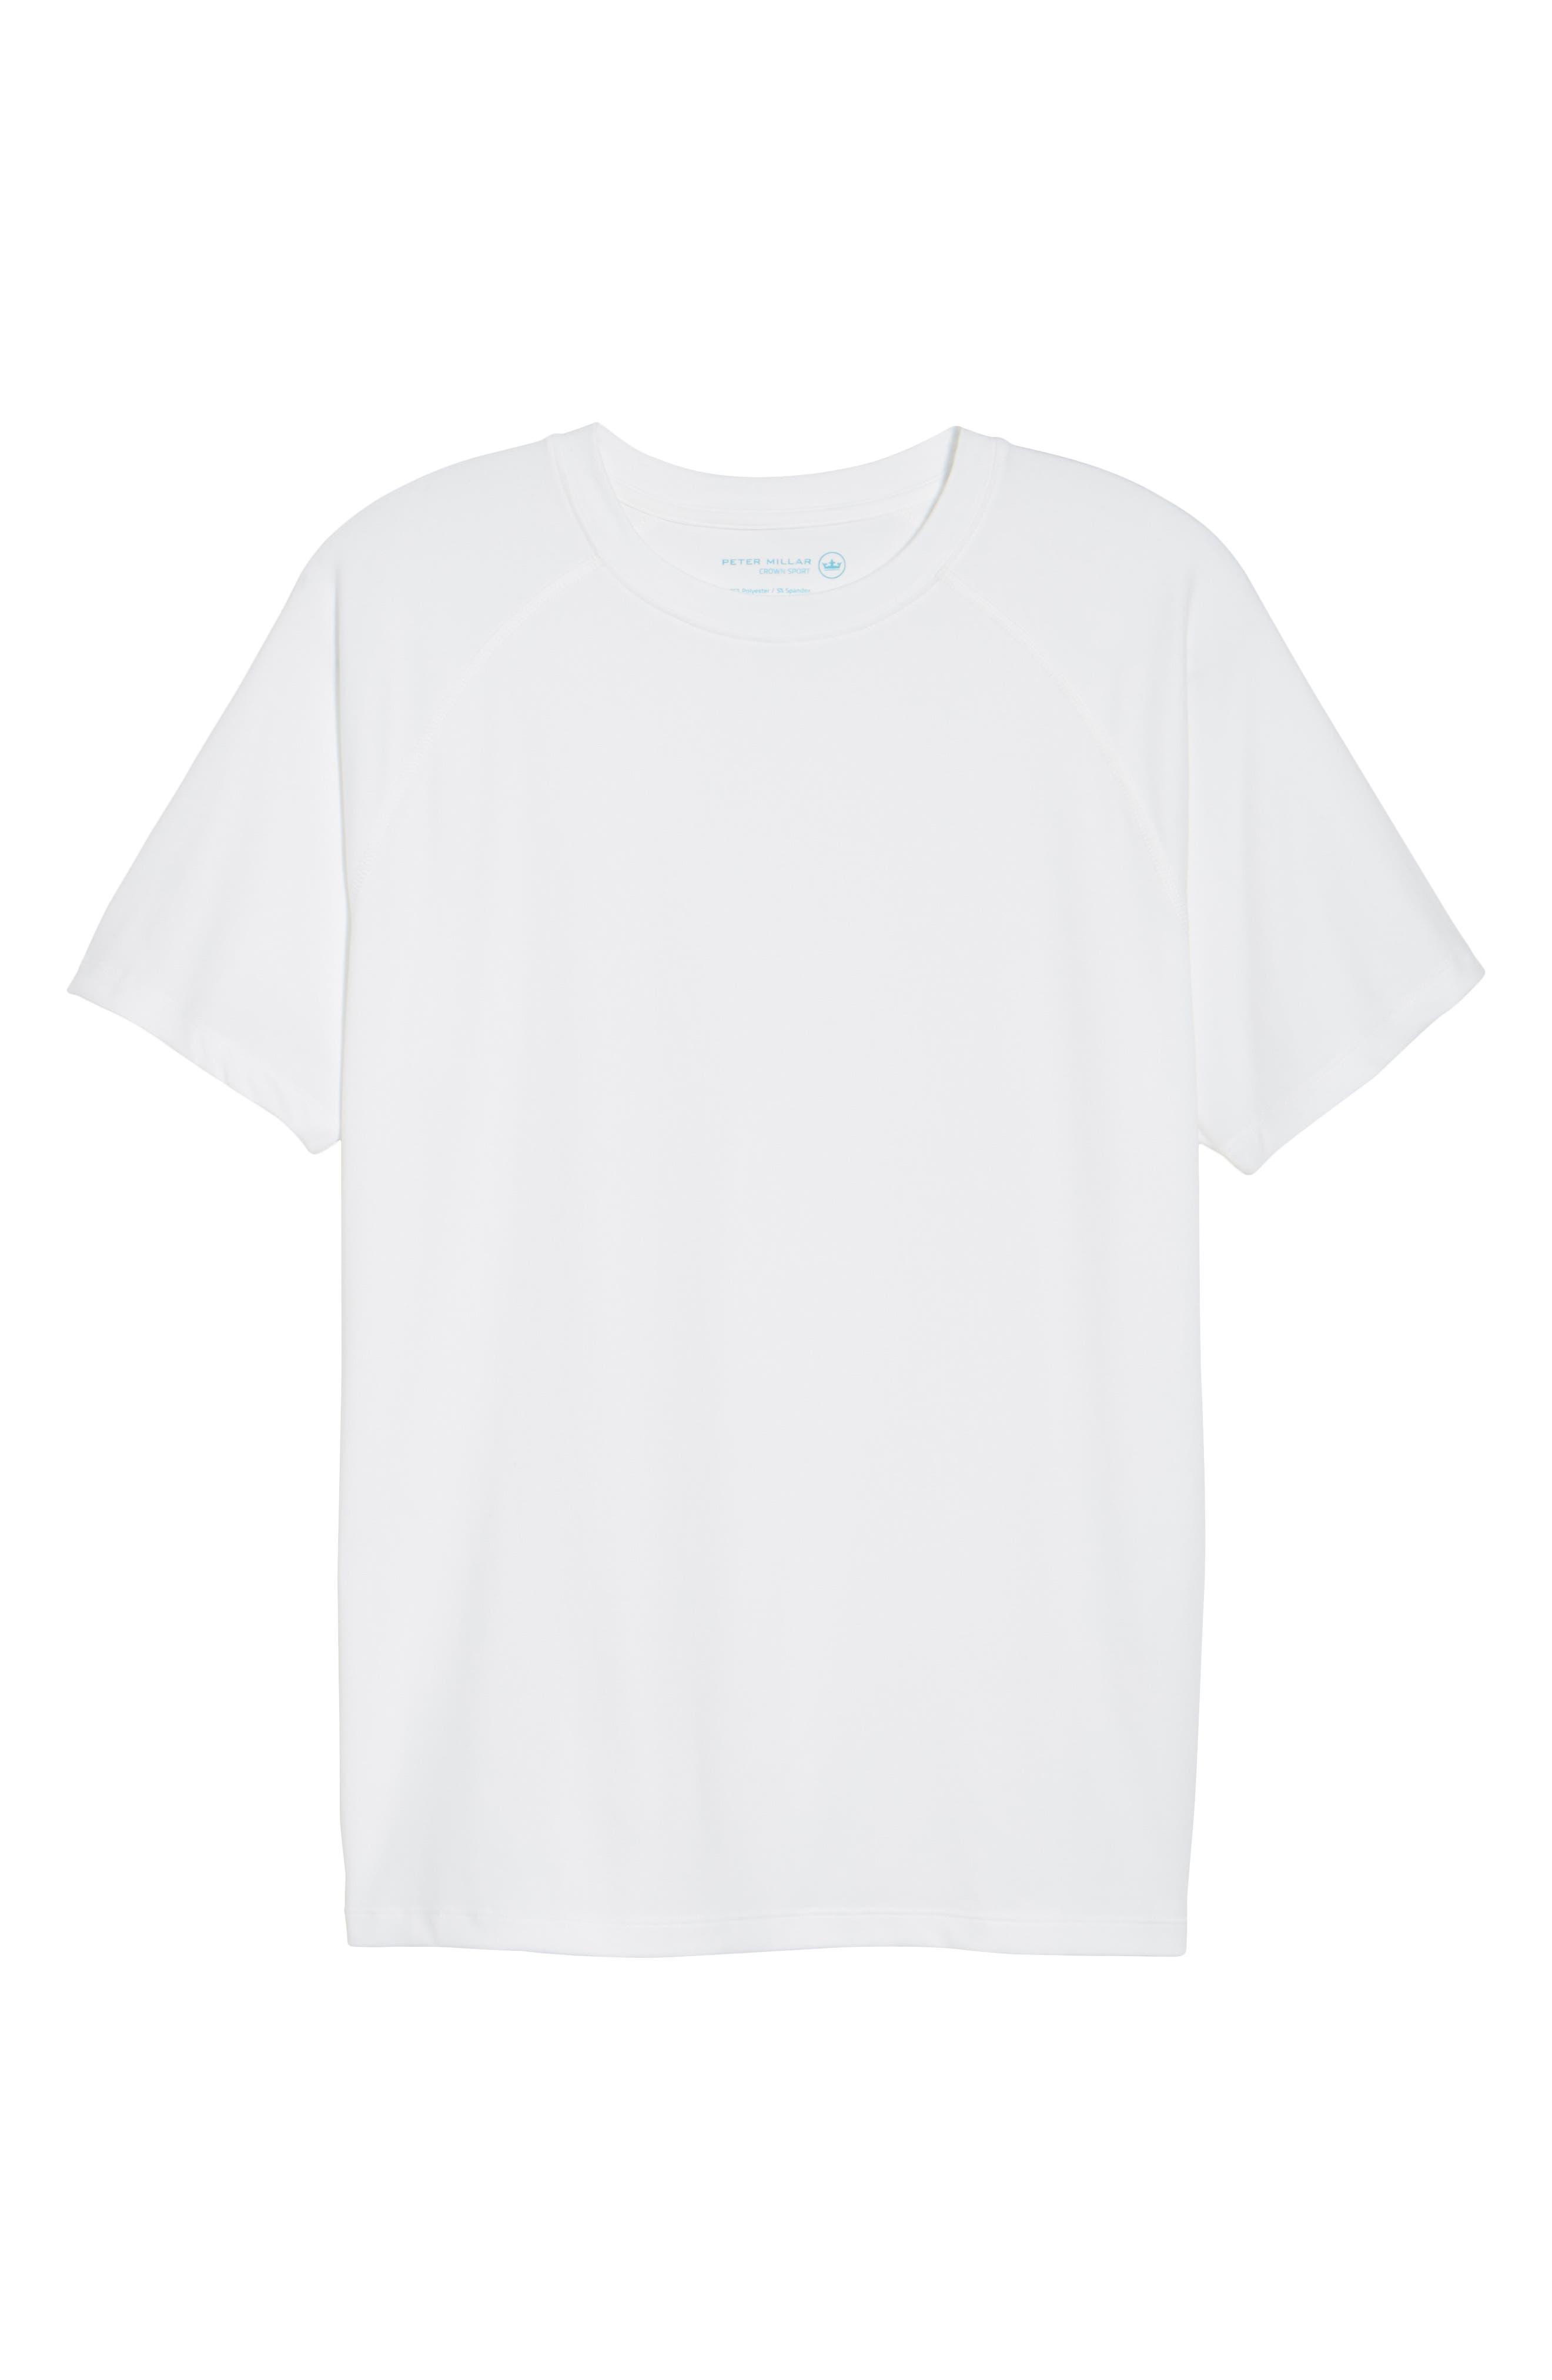 Rio Technical T-Shirt,                             Alternate thumbnail 6, color,                             White